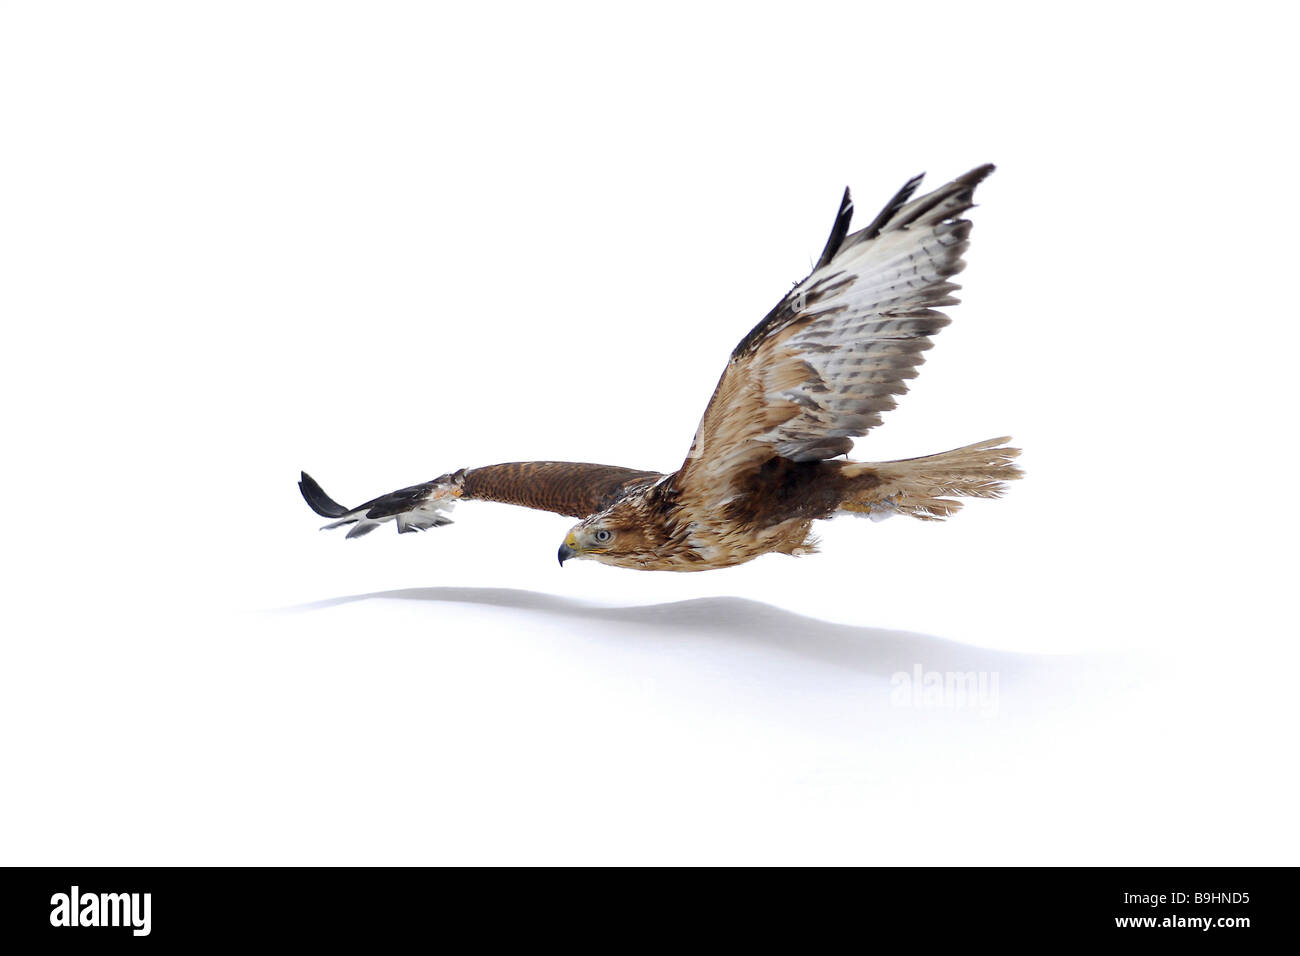 Long-legged Buzzard (Buteo rufinus), with reddish tint, in flight - Stock Image